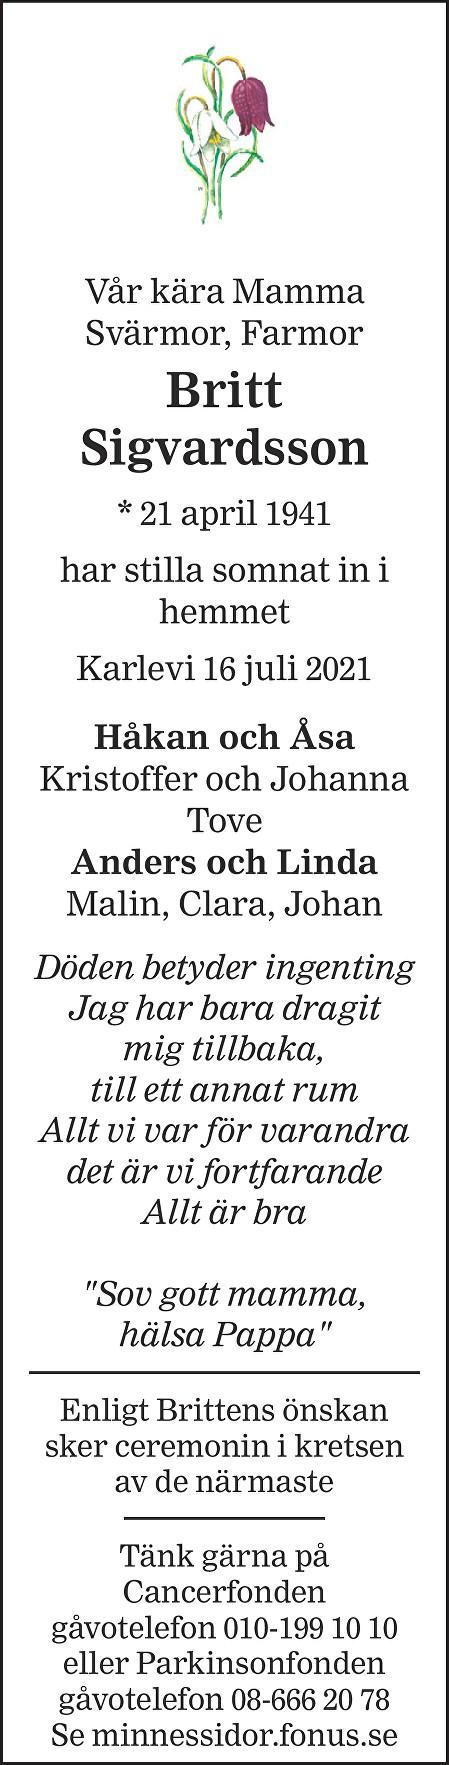 Britt Sigvardsson Death notice